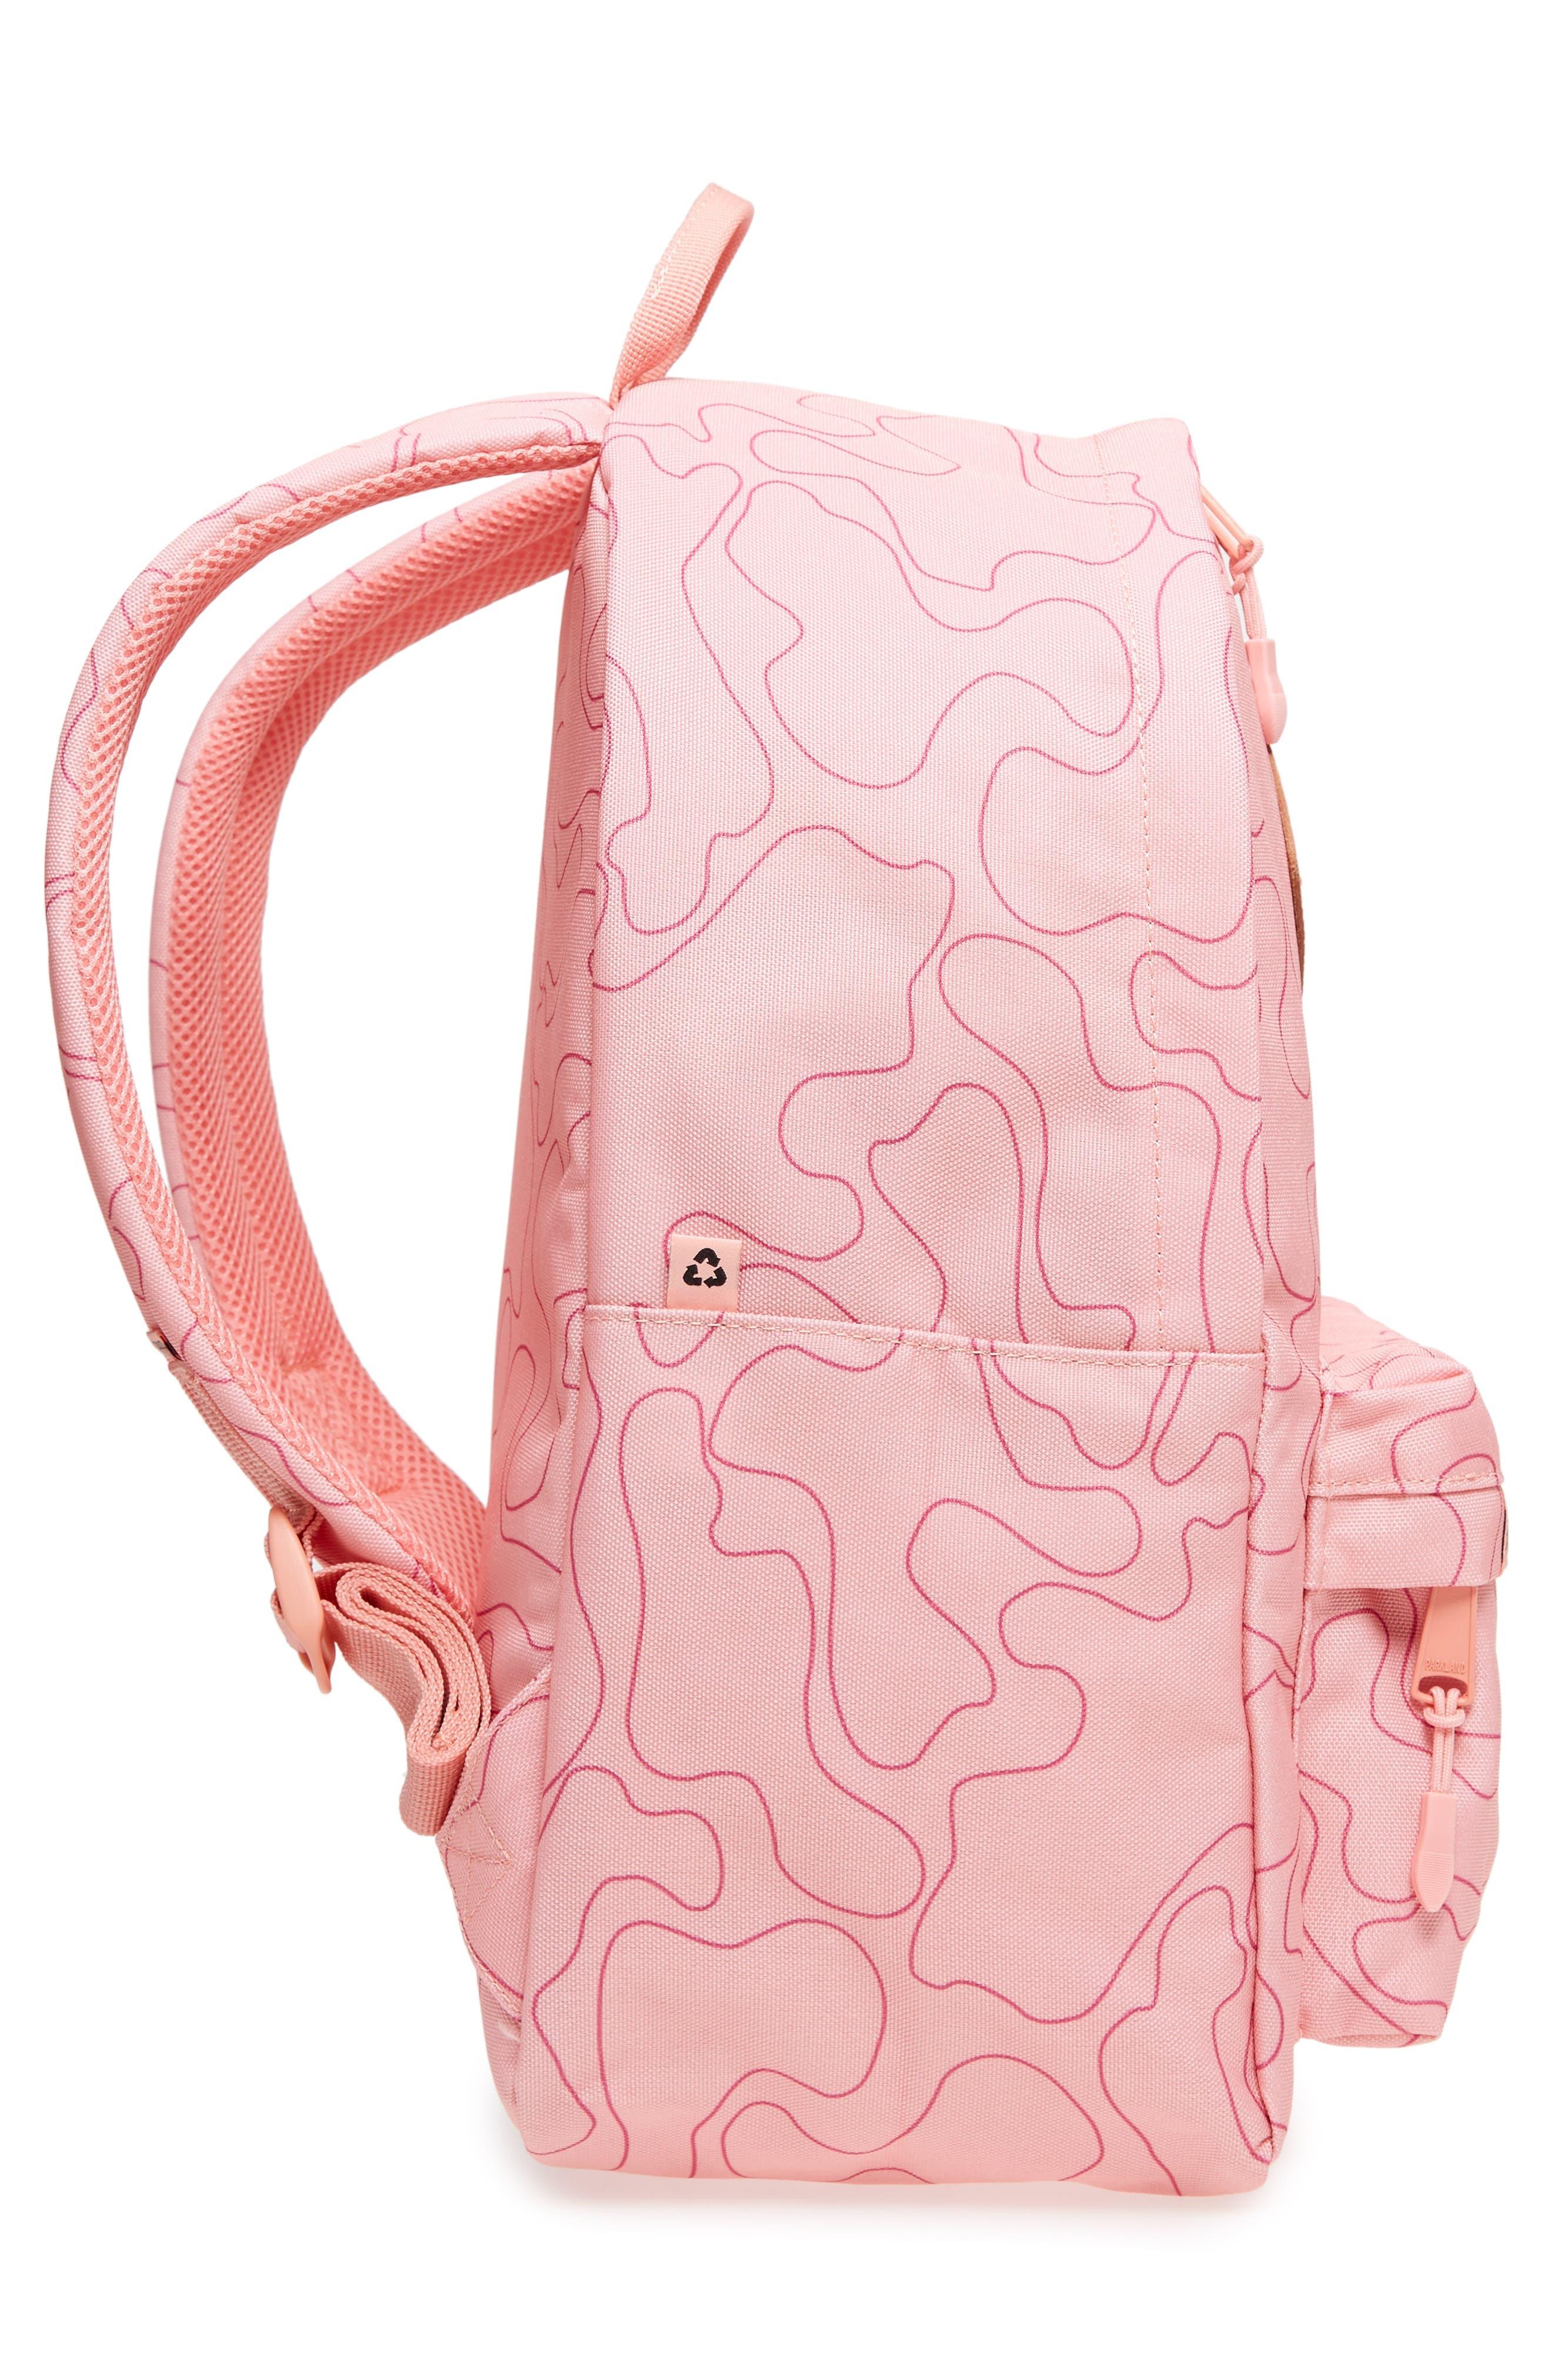 Bayside Shadow Camo Backpack,                             Alternate thumbnail 4, color,                             250